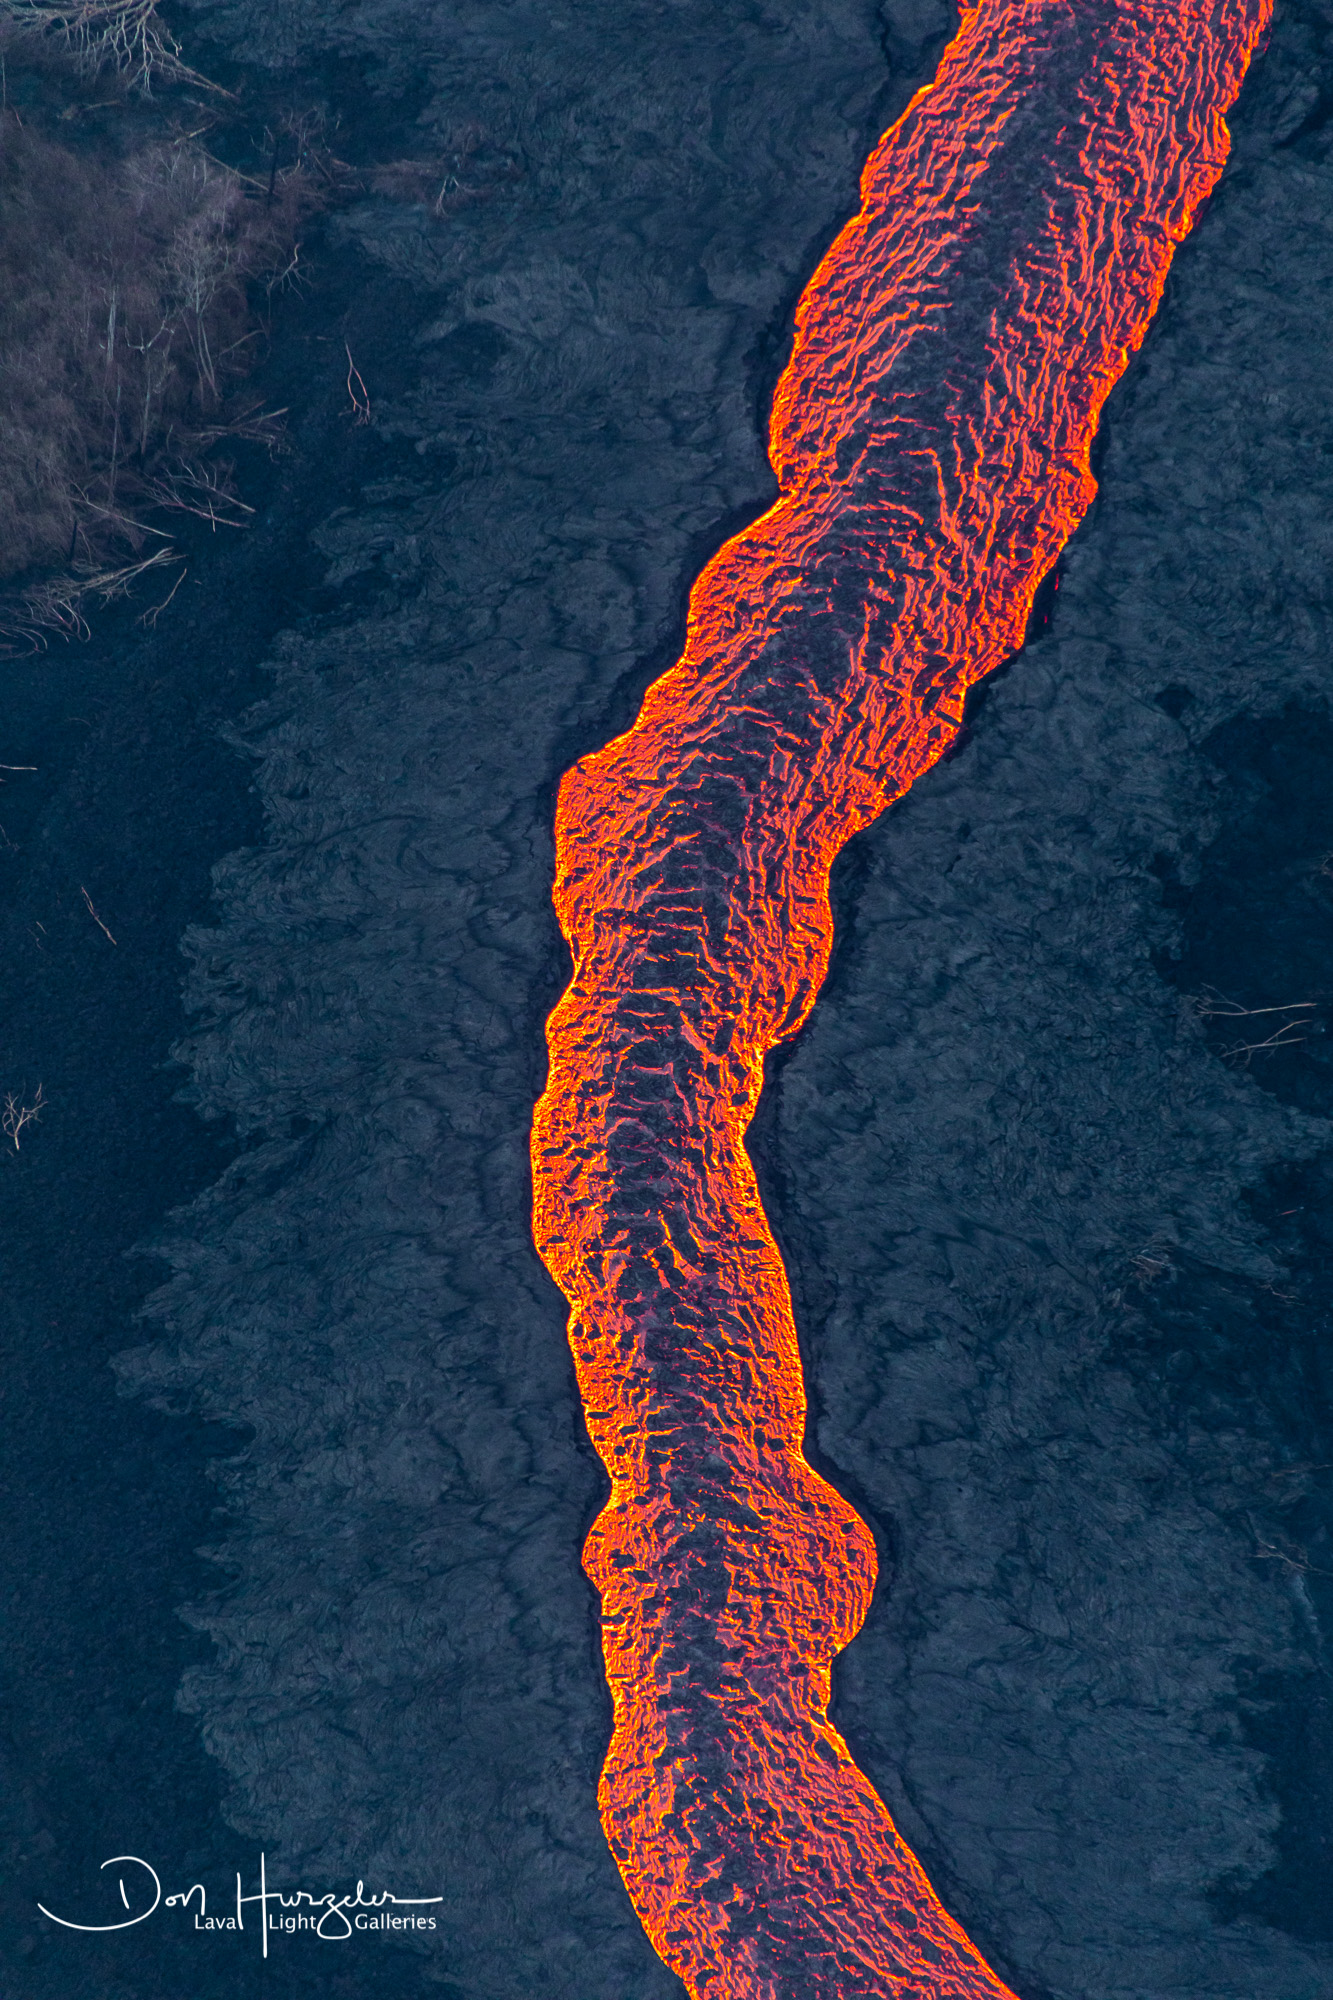 More of the lava river.